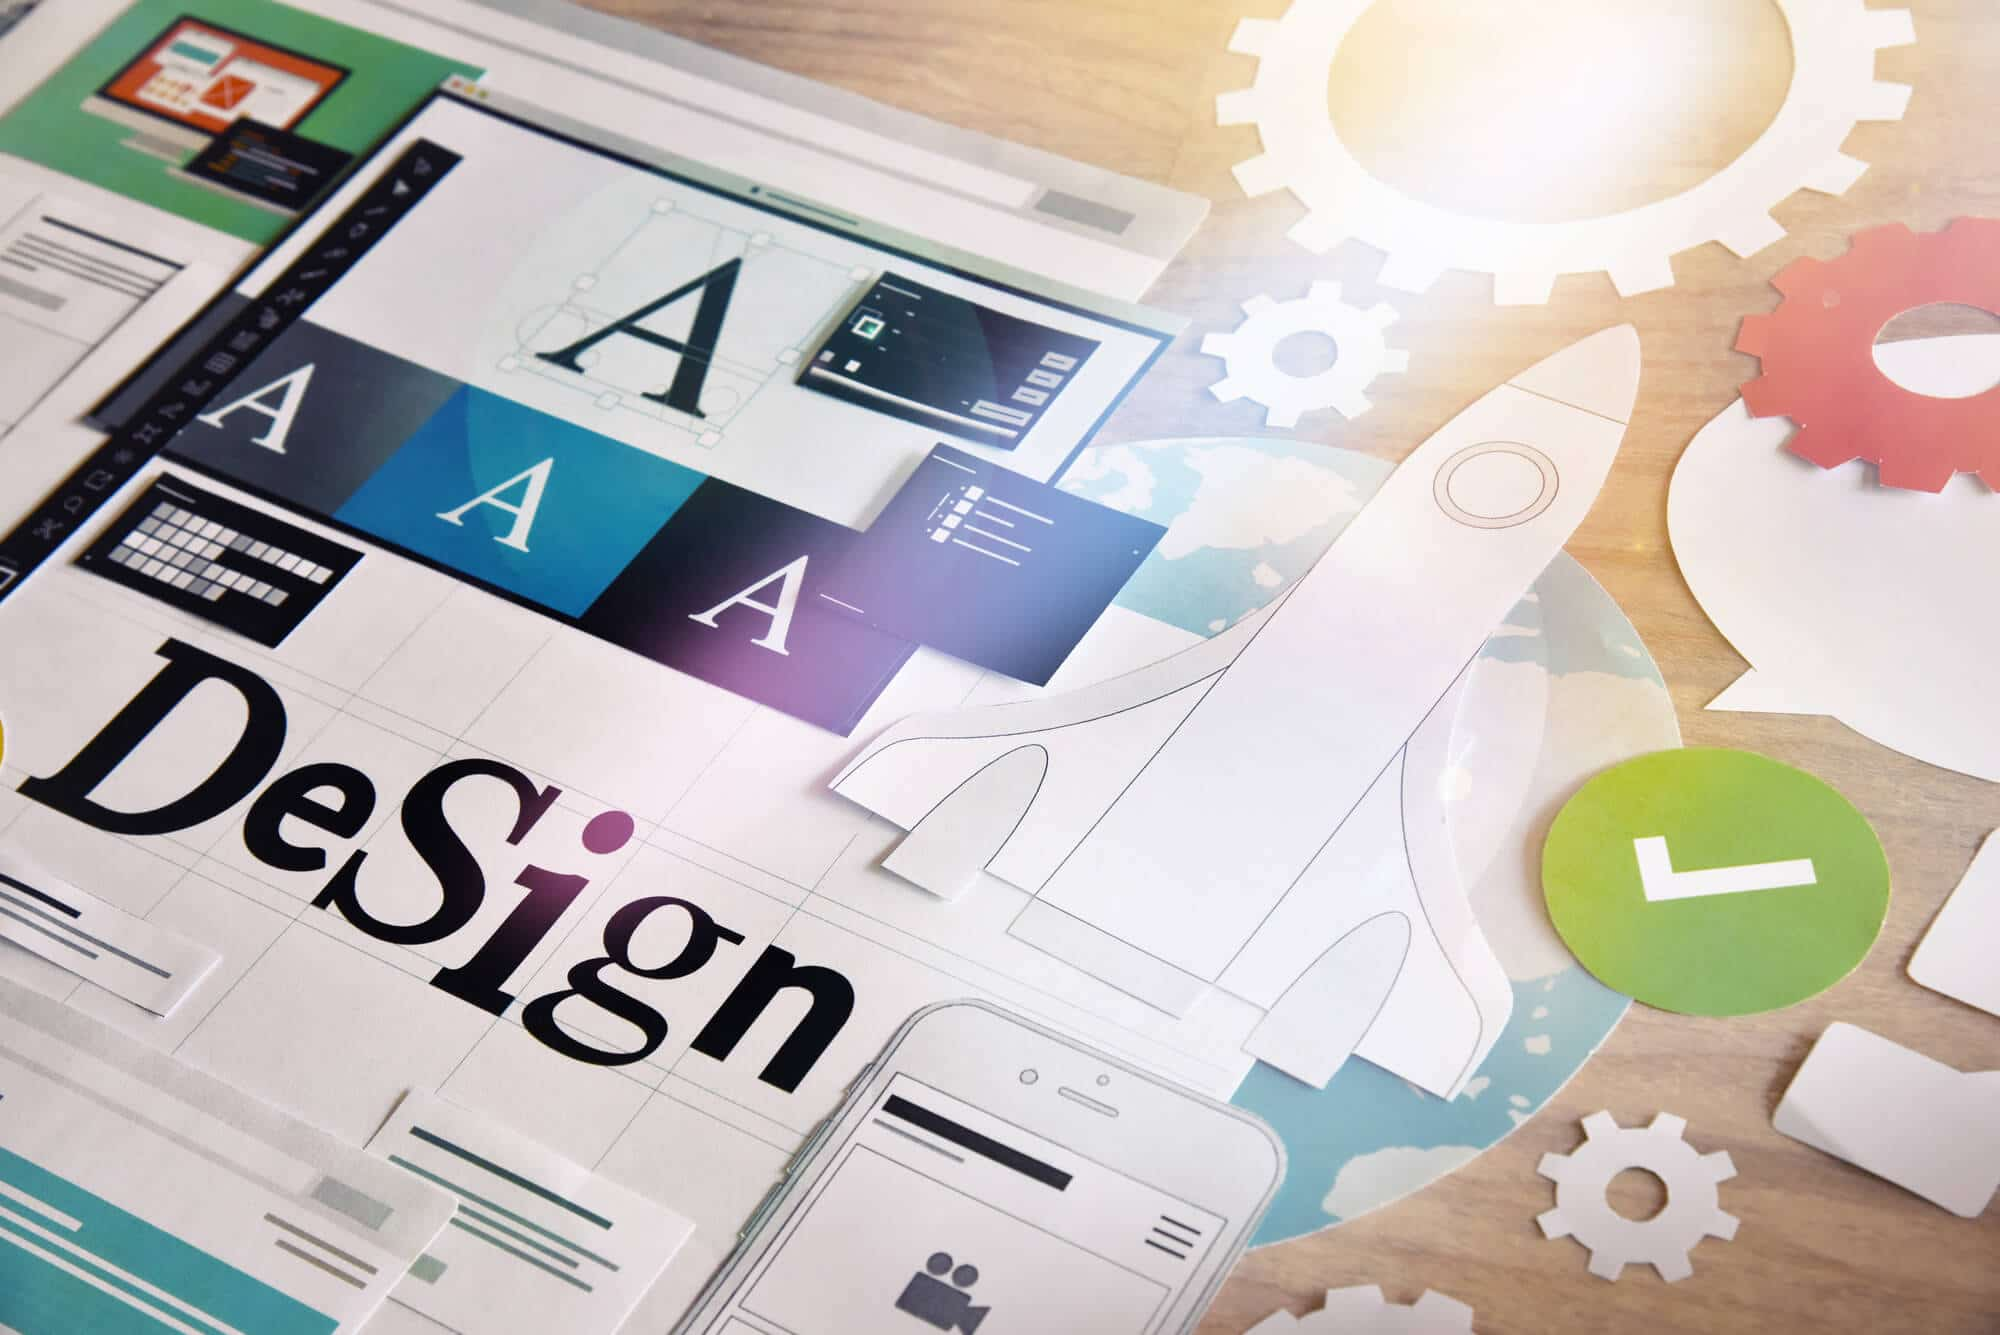 Web Design Services - Big Easy SEO